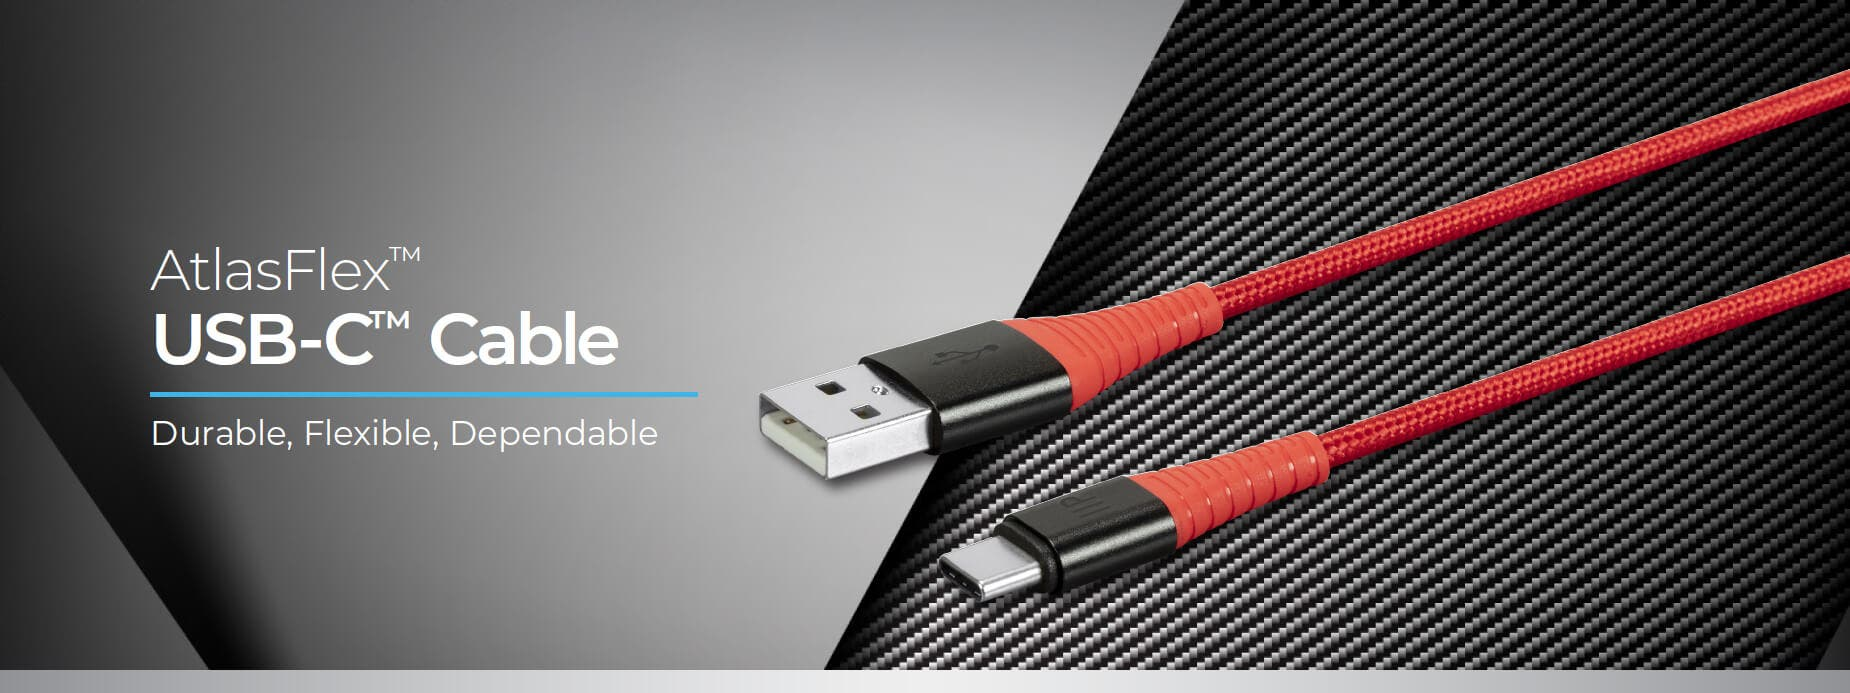 AtlasFlex USB-C Cable